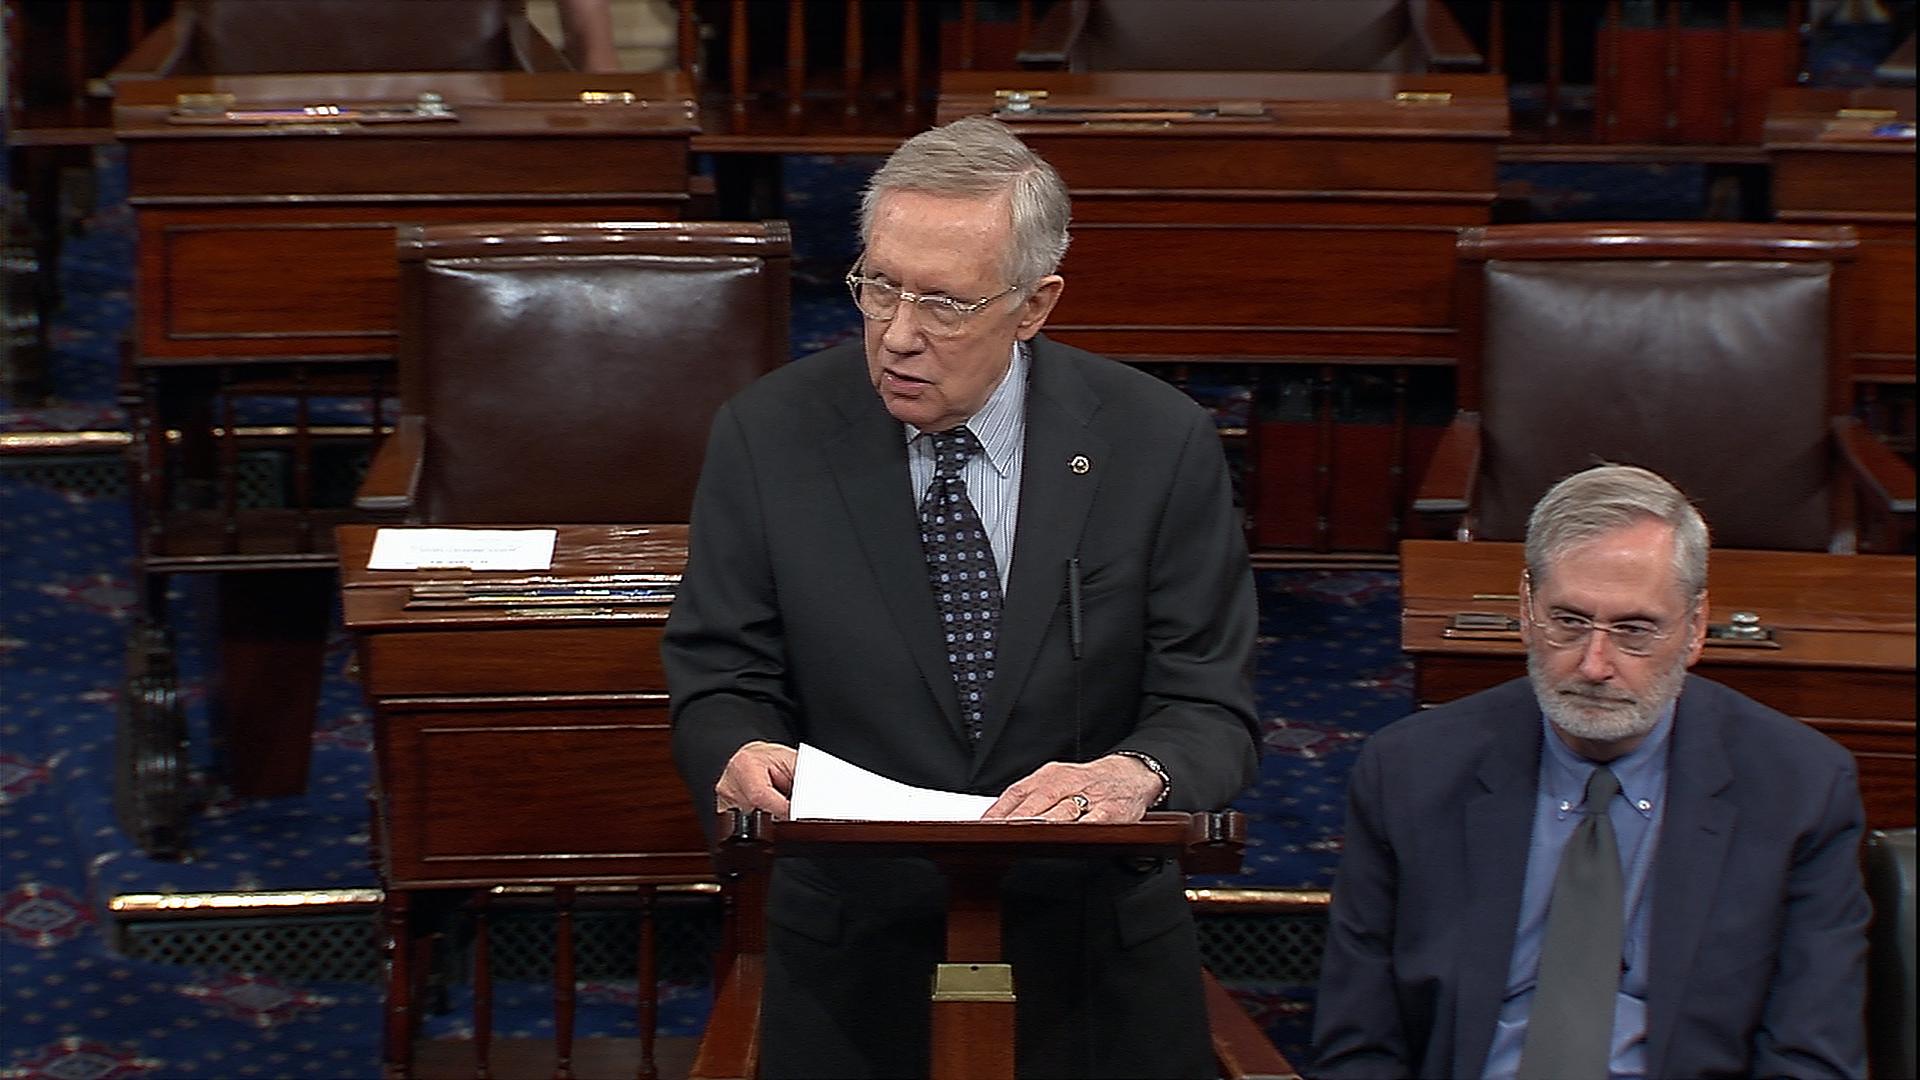 Senator Reid says he 'will miss' Speaker...